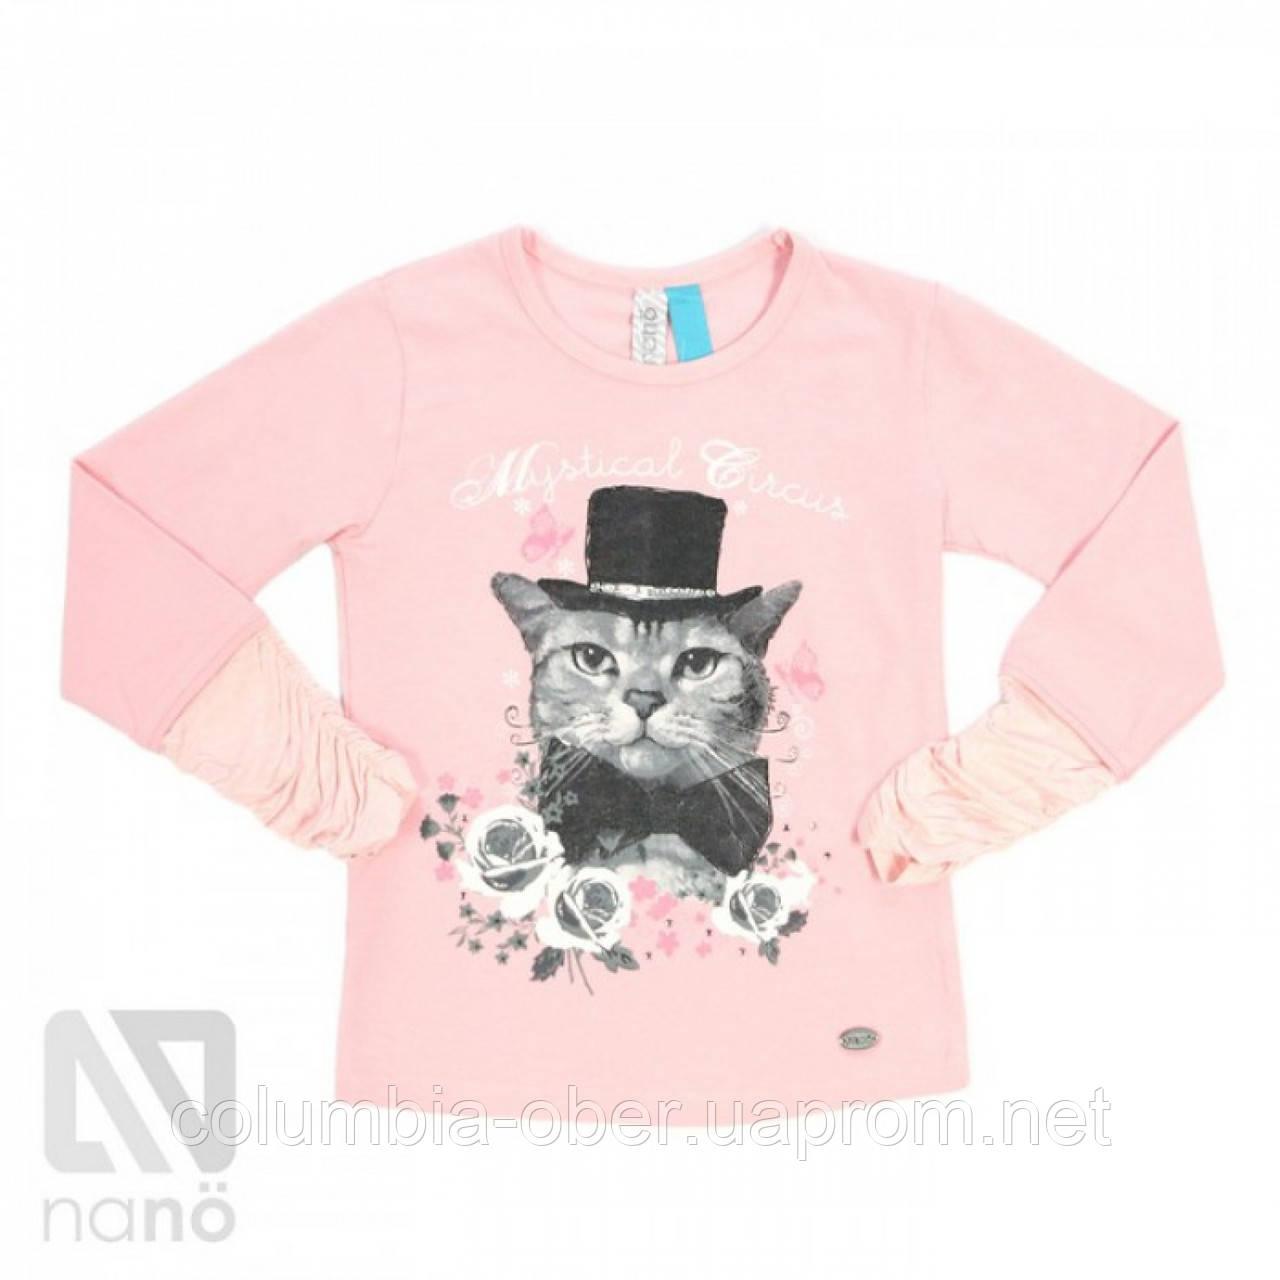 Блуза для девочки Nano F1422-01 Soft Rose. Размеры 92-142.